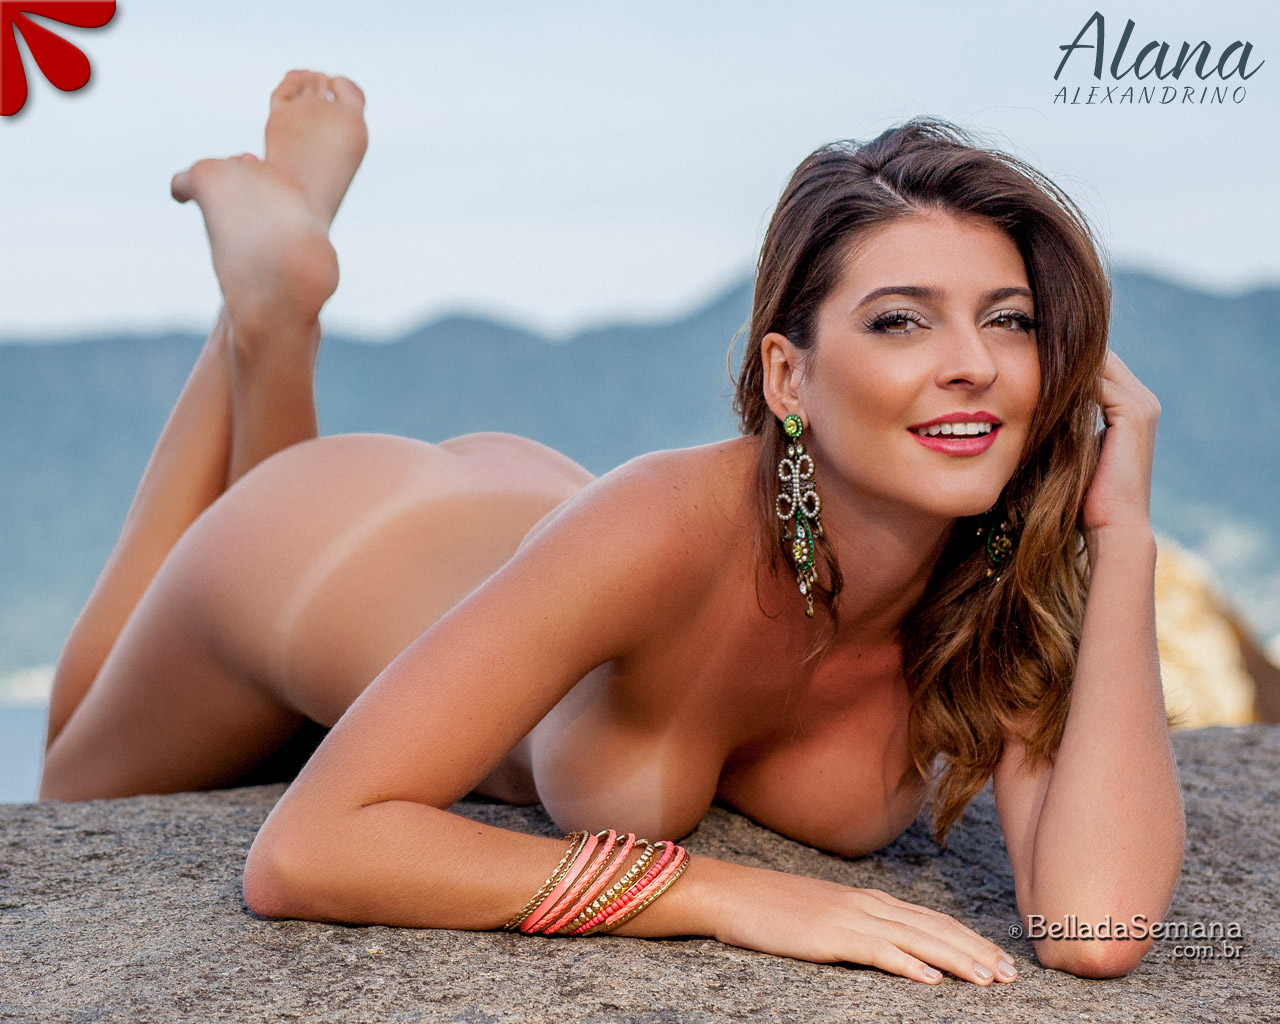 Alana Alexandrino – Gata mais Gostosa da Semana